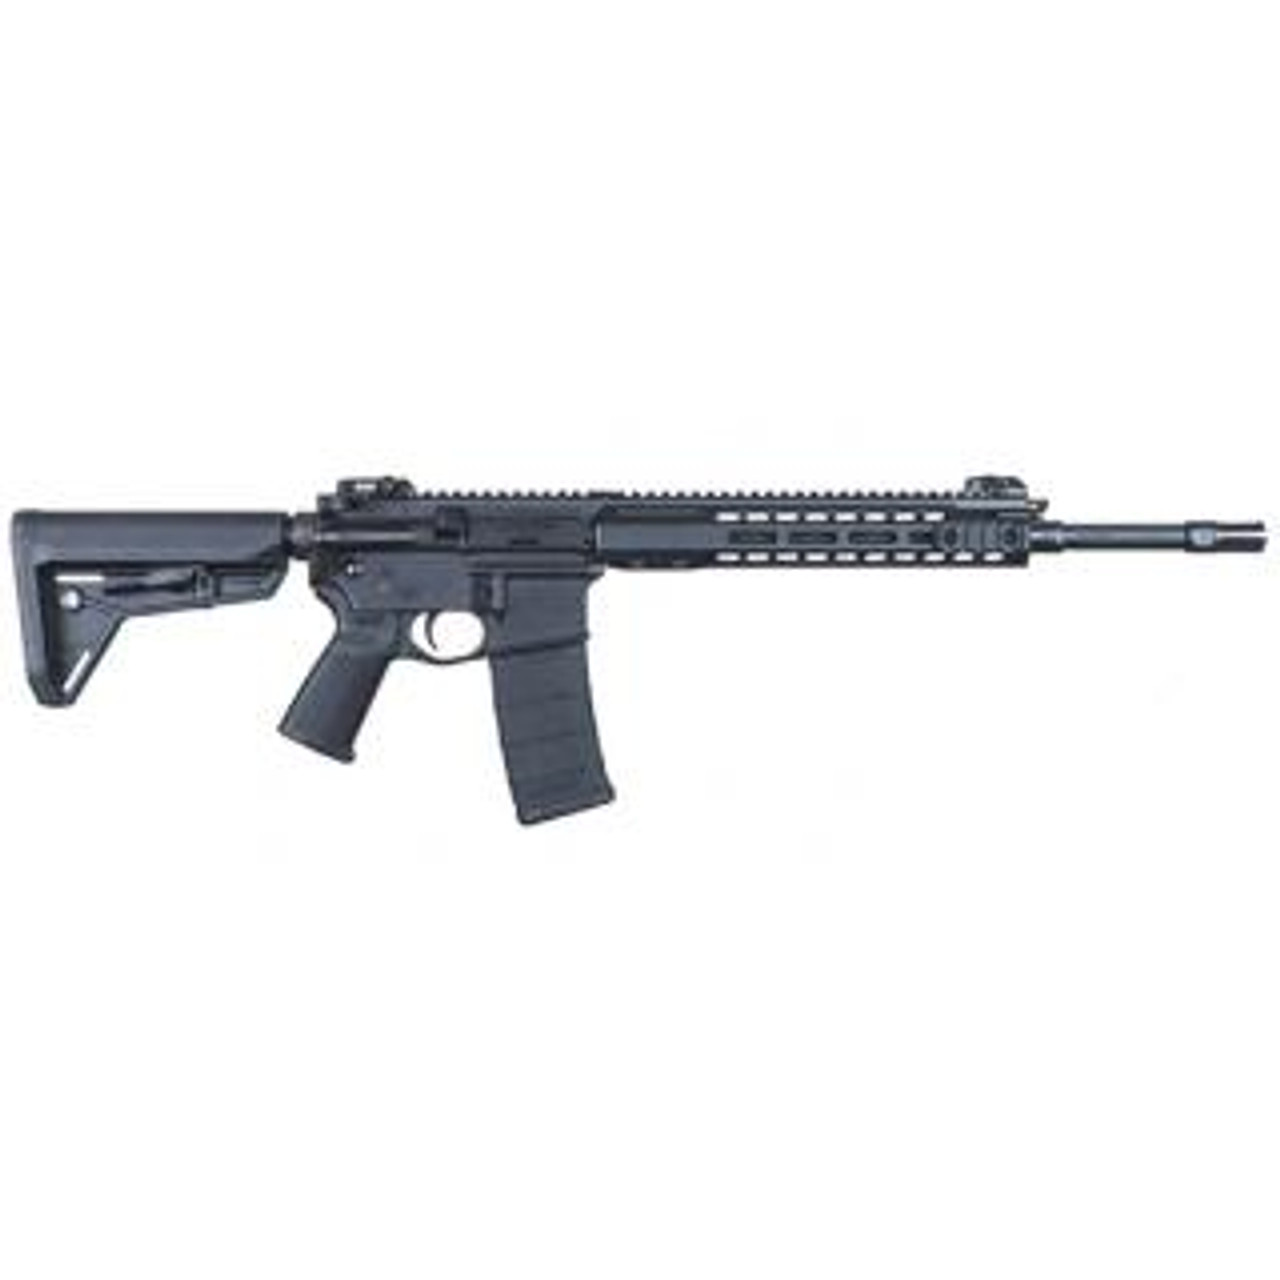 Barrett REC7 Carbine Flyweight CALIFORNIA LEGAL - .223/5.56